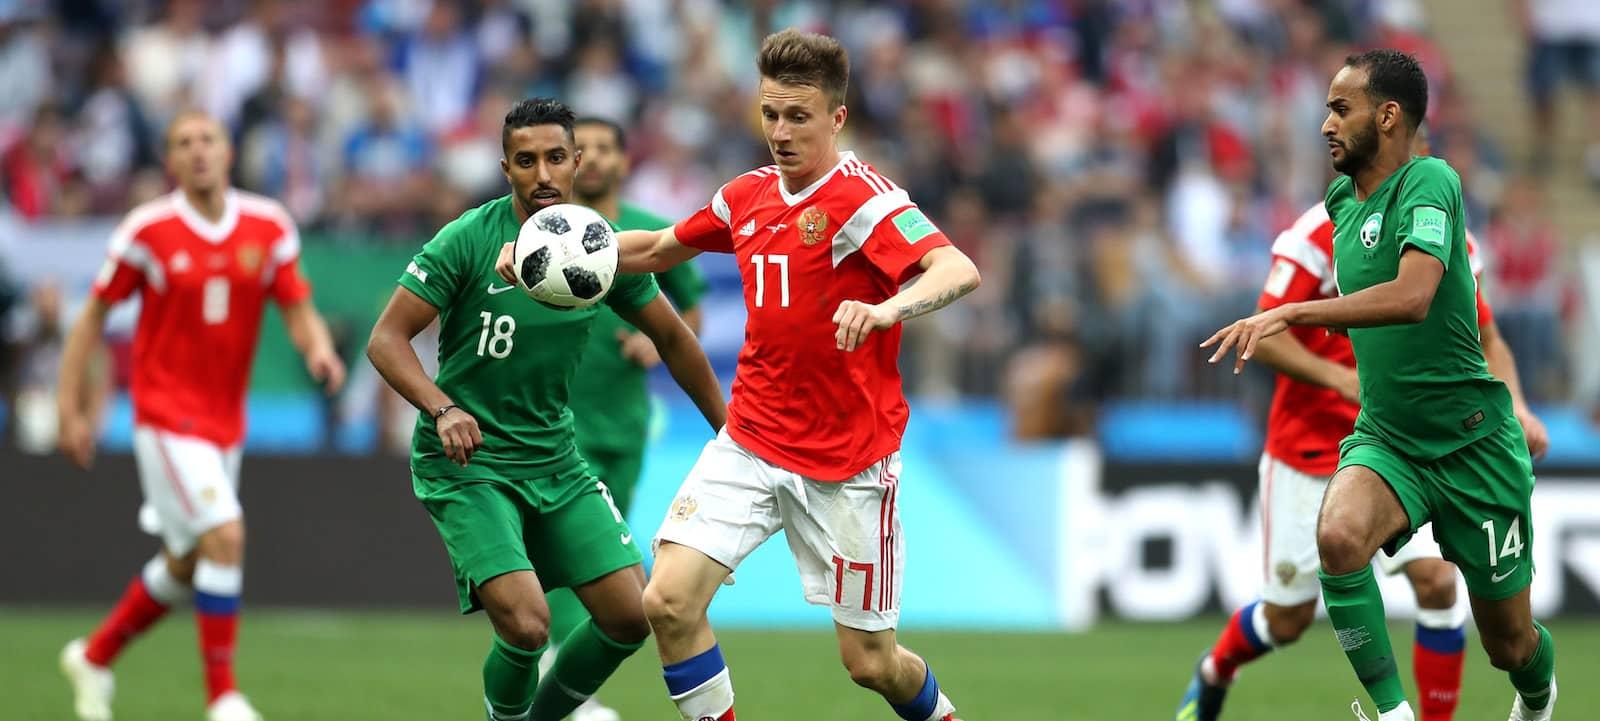 Jose Mourinho: Aleksandr Golovin gives Russia dynamism